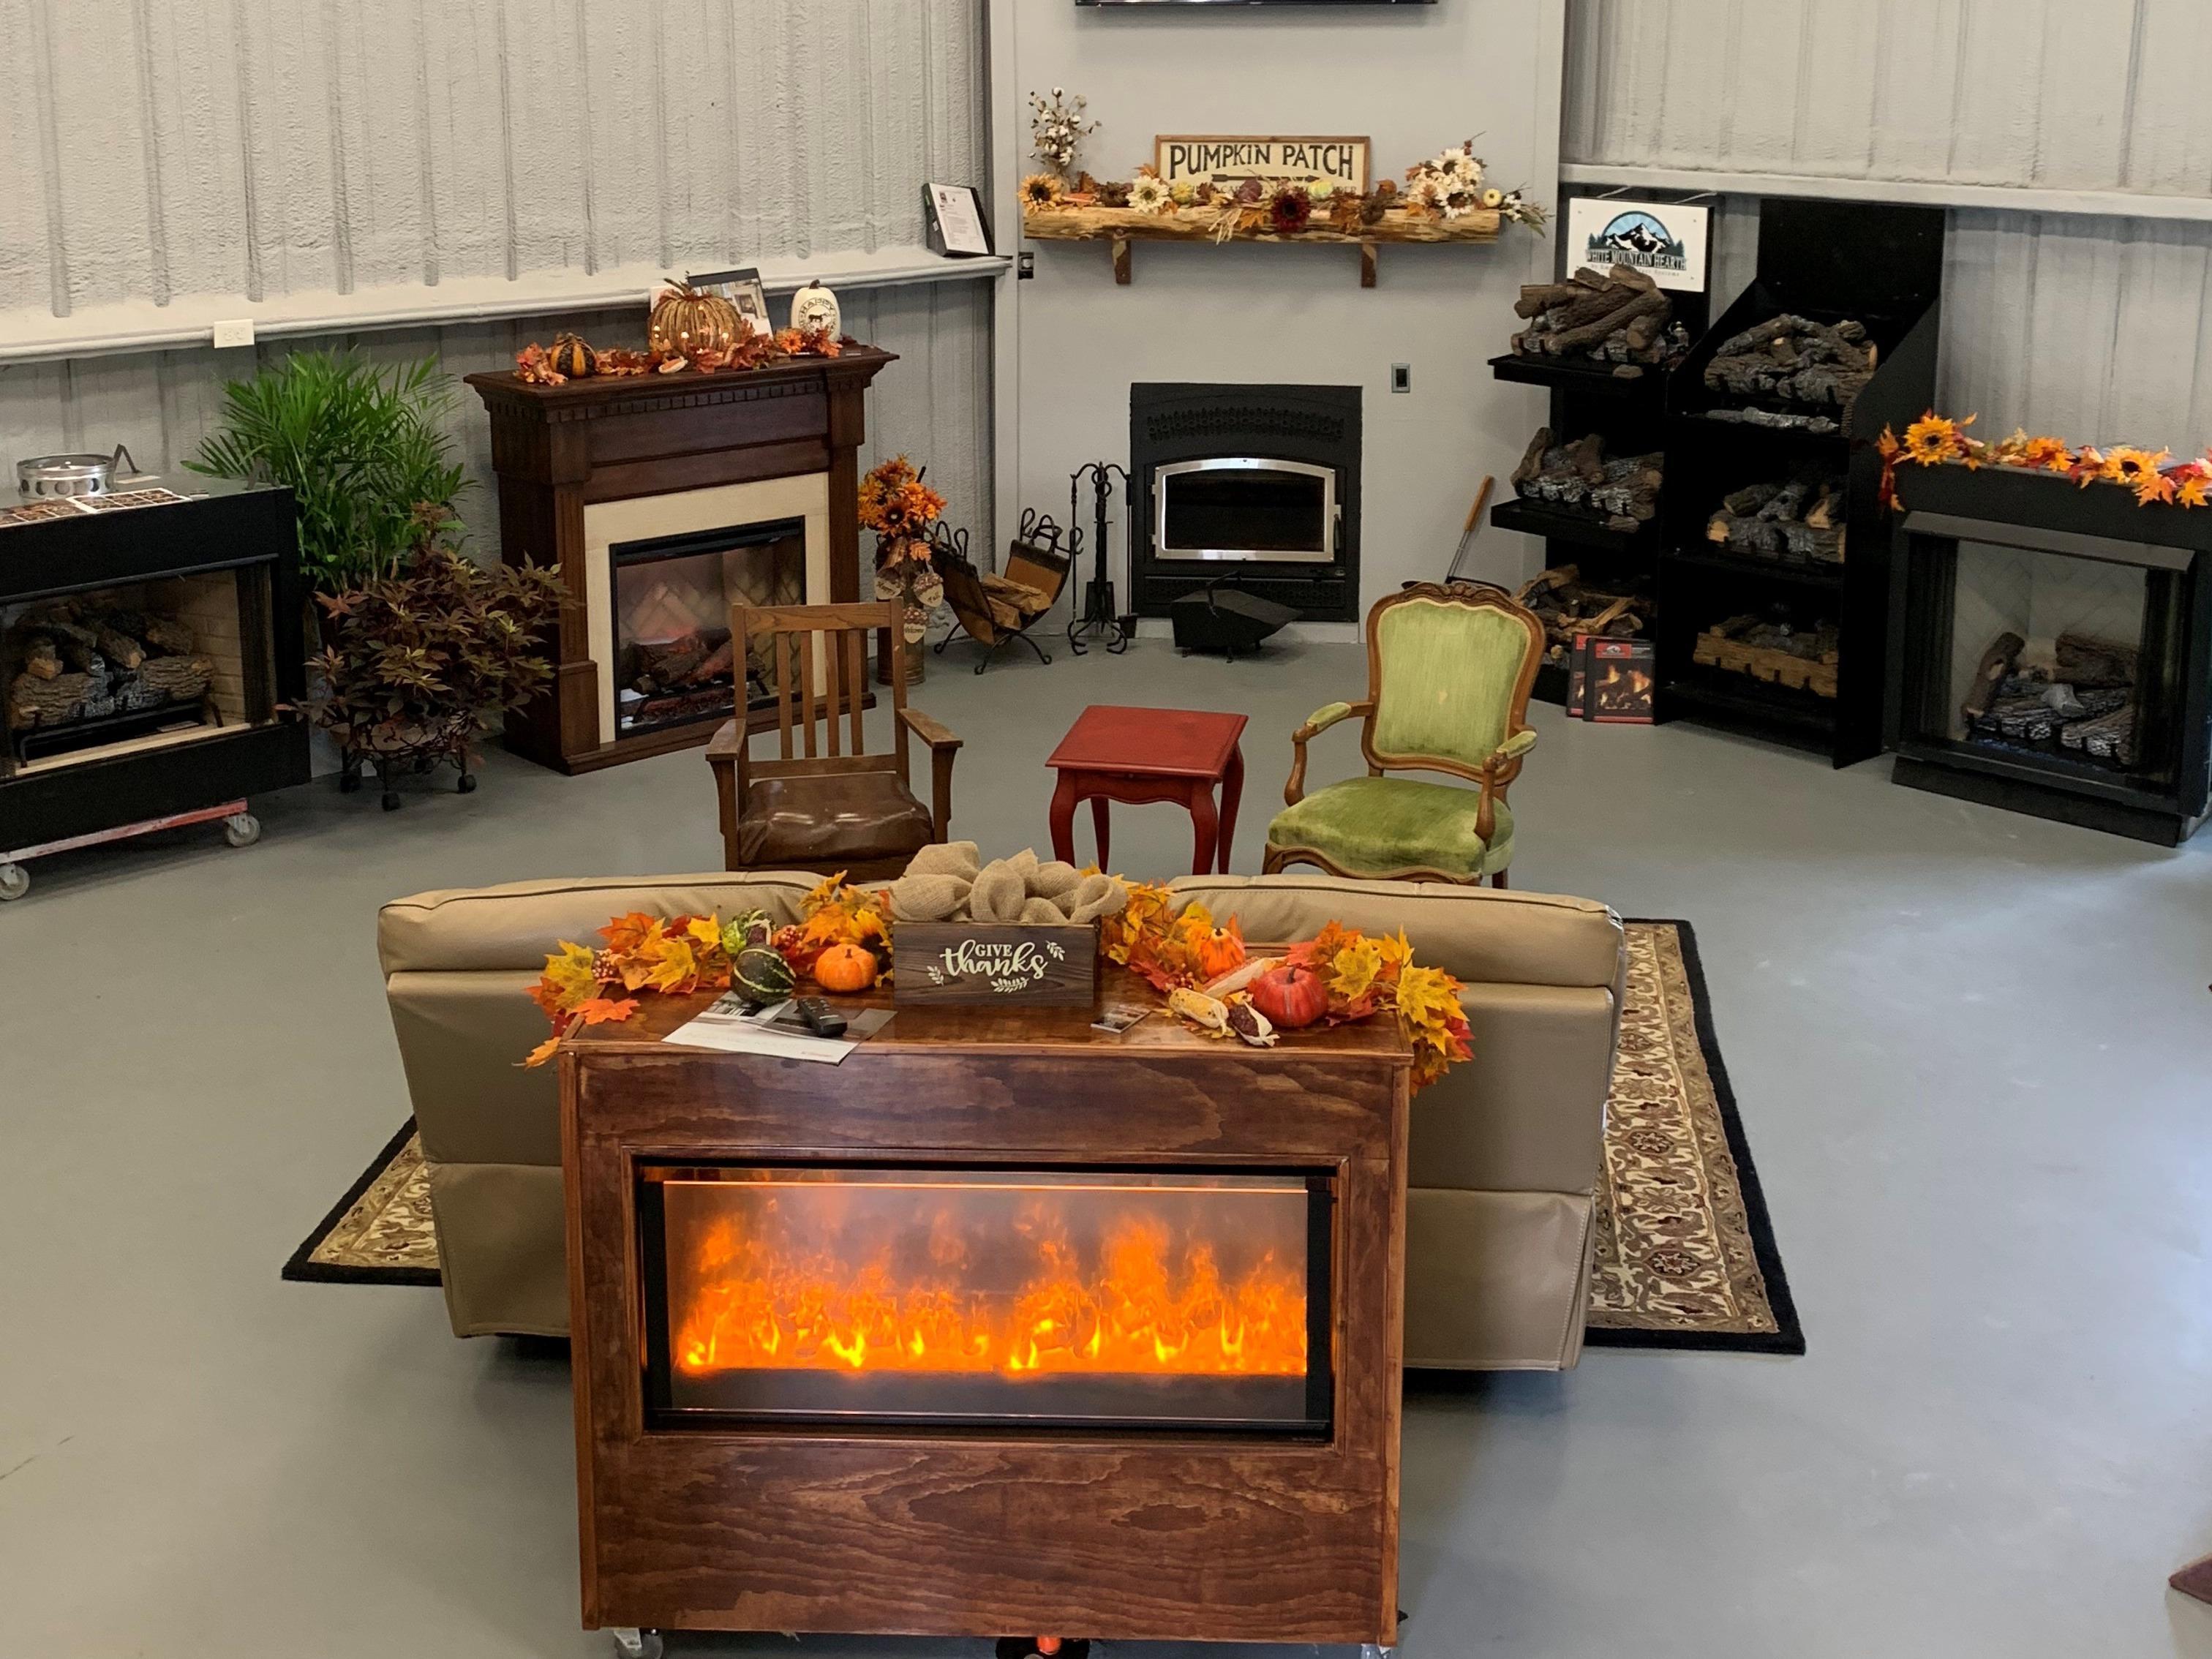 Blazin Hot Fireplaces image 10